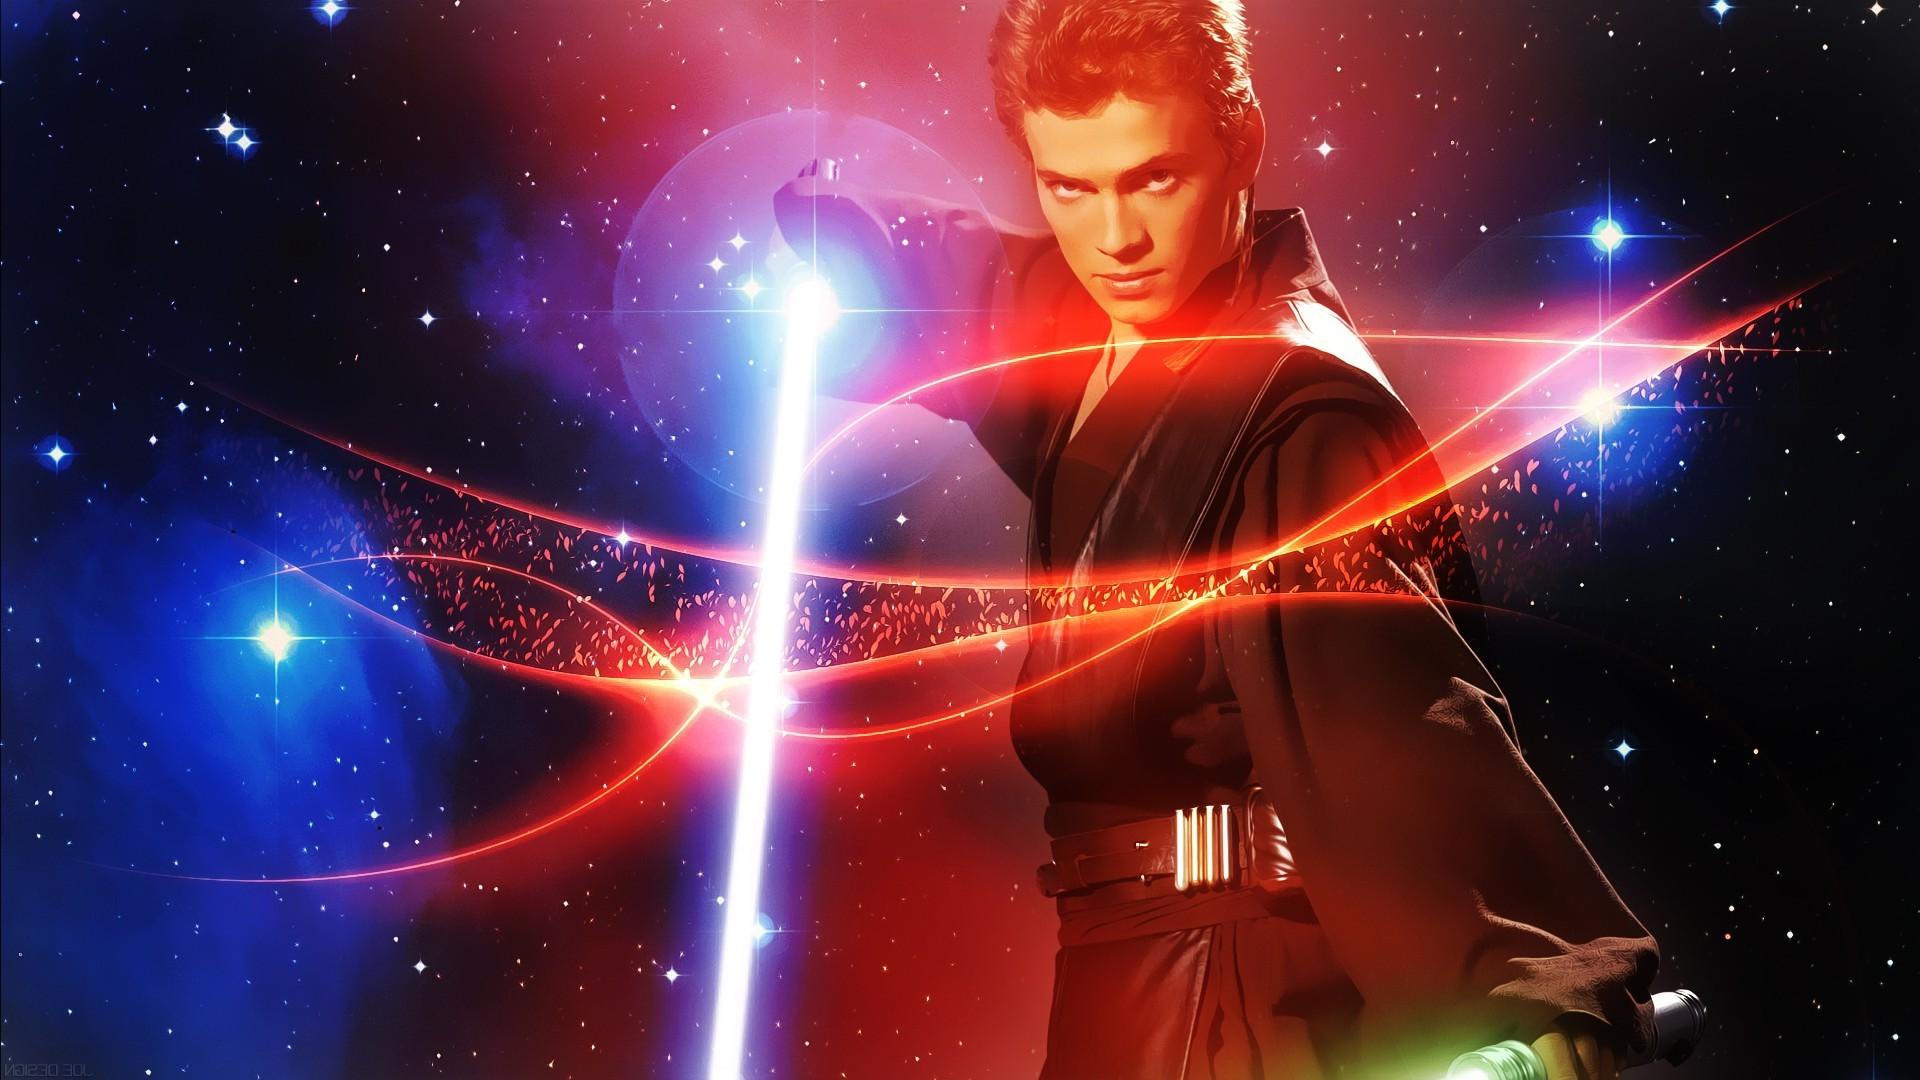 Illustration Star Wars Space Movies Universe Anakin Skywalker Screenshot 1920x1080 Px Computer Wallpaper Special Effects